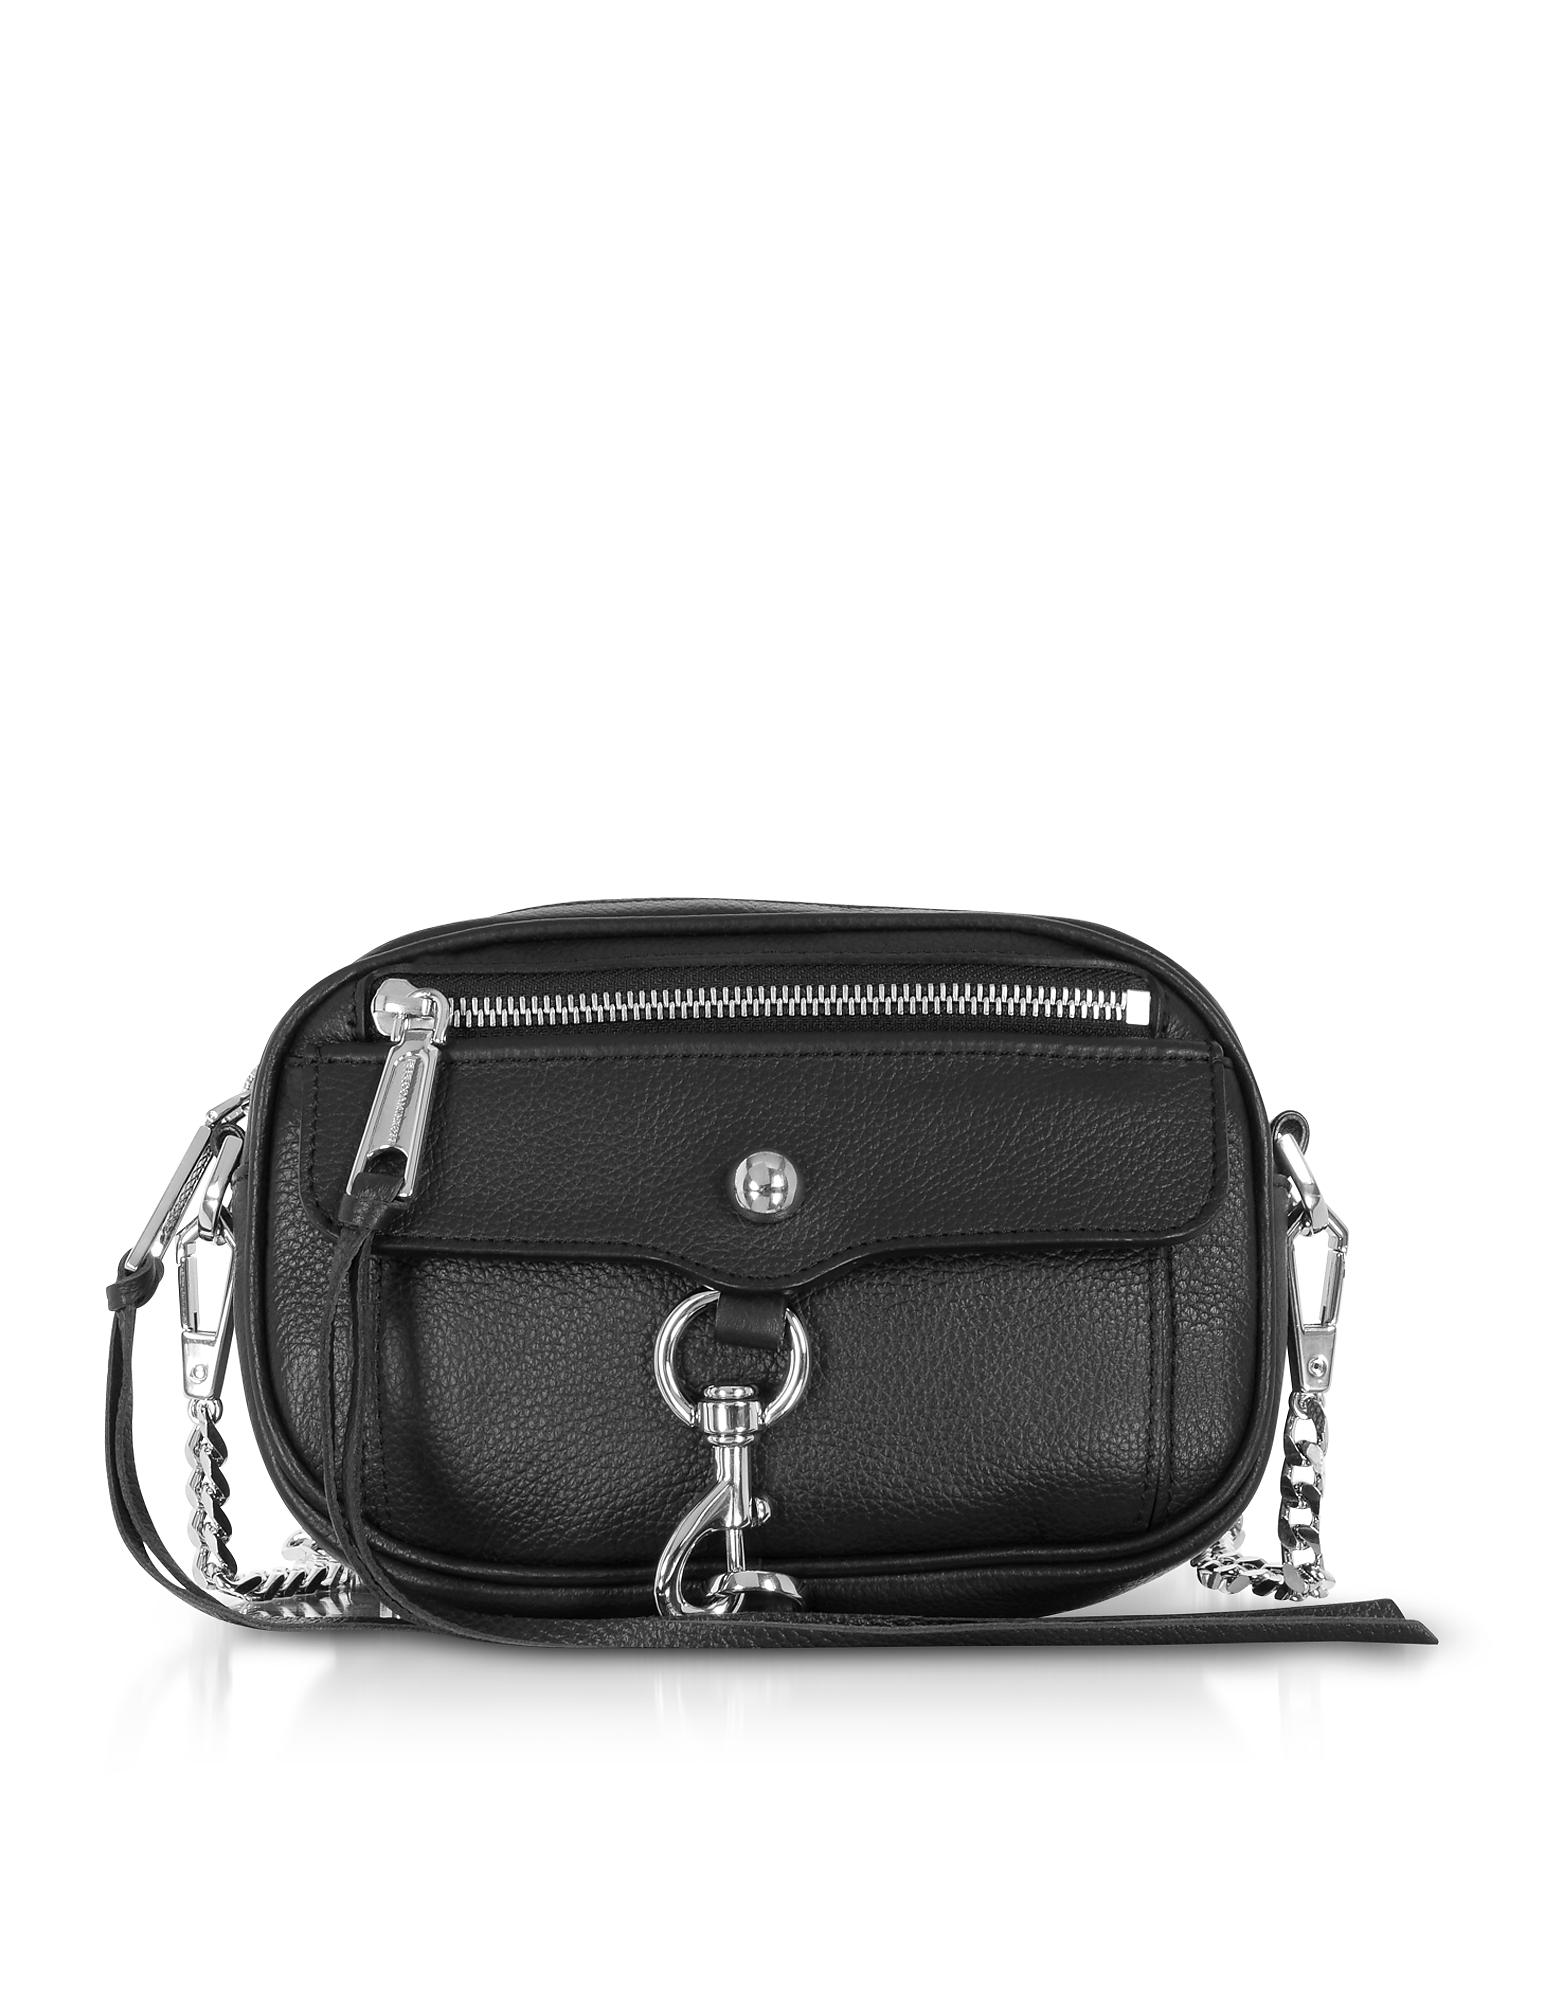 Black Pebbled Leather Blythe Xbody Bag